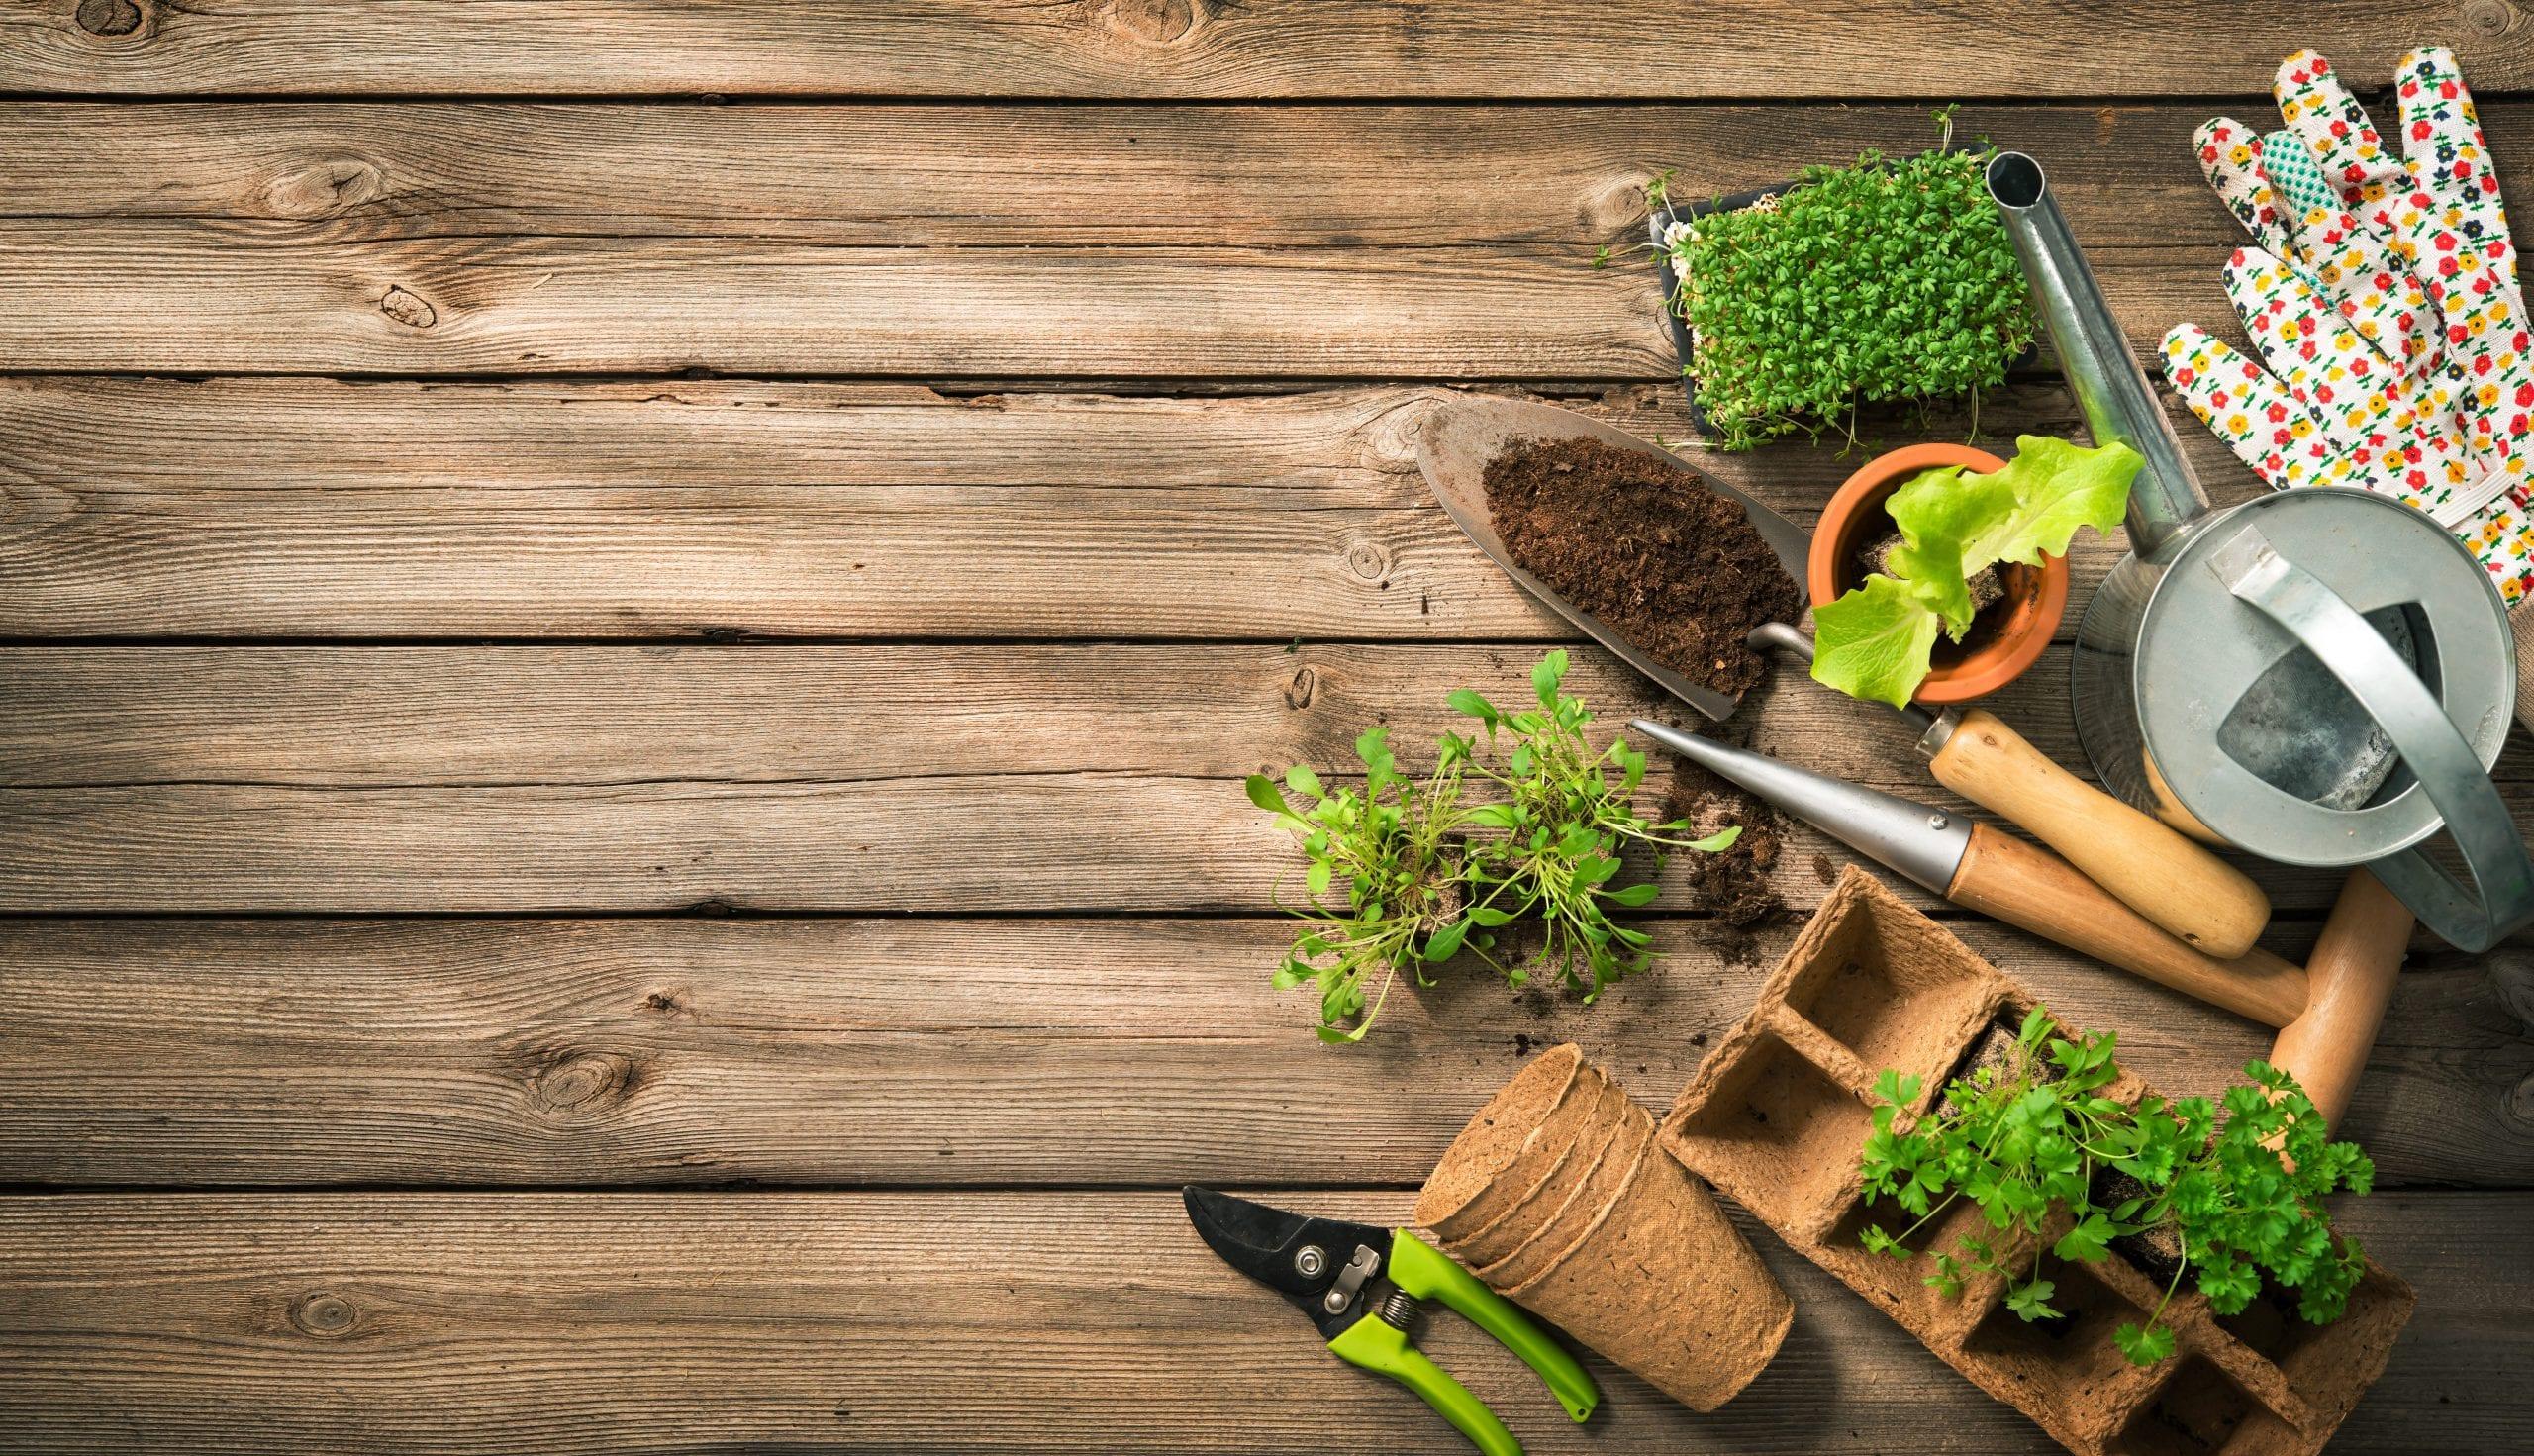 garden tools buying guide